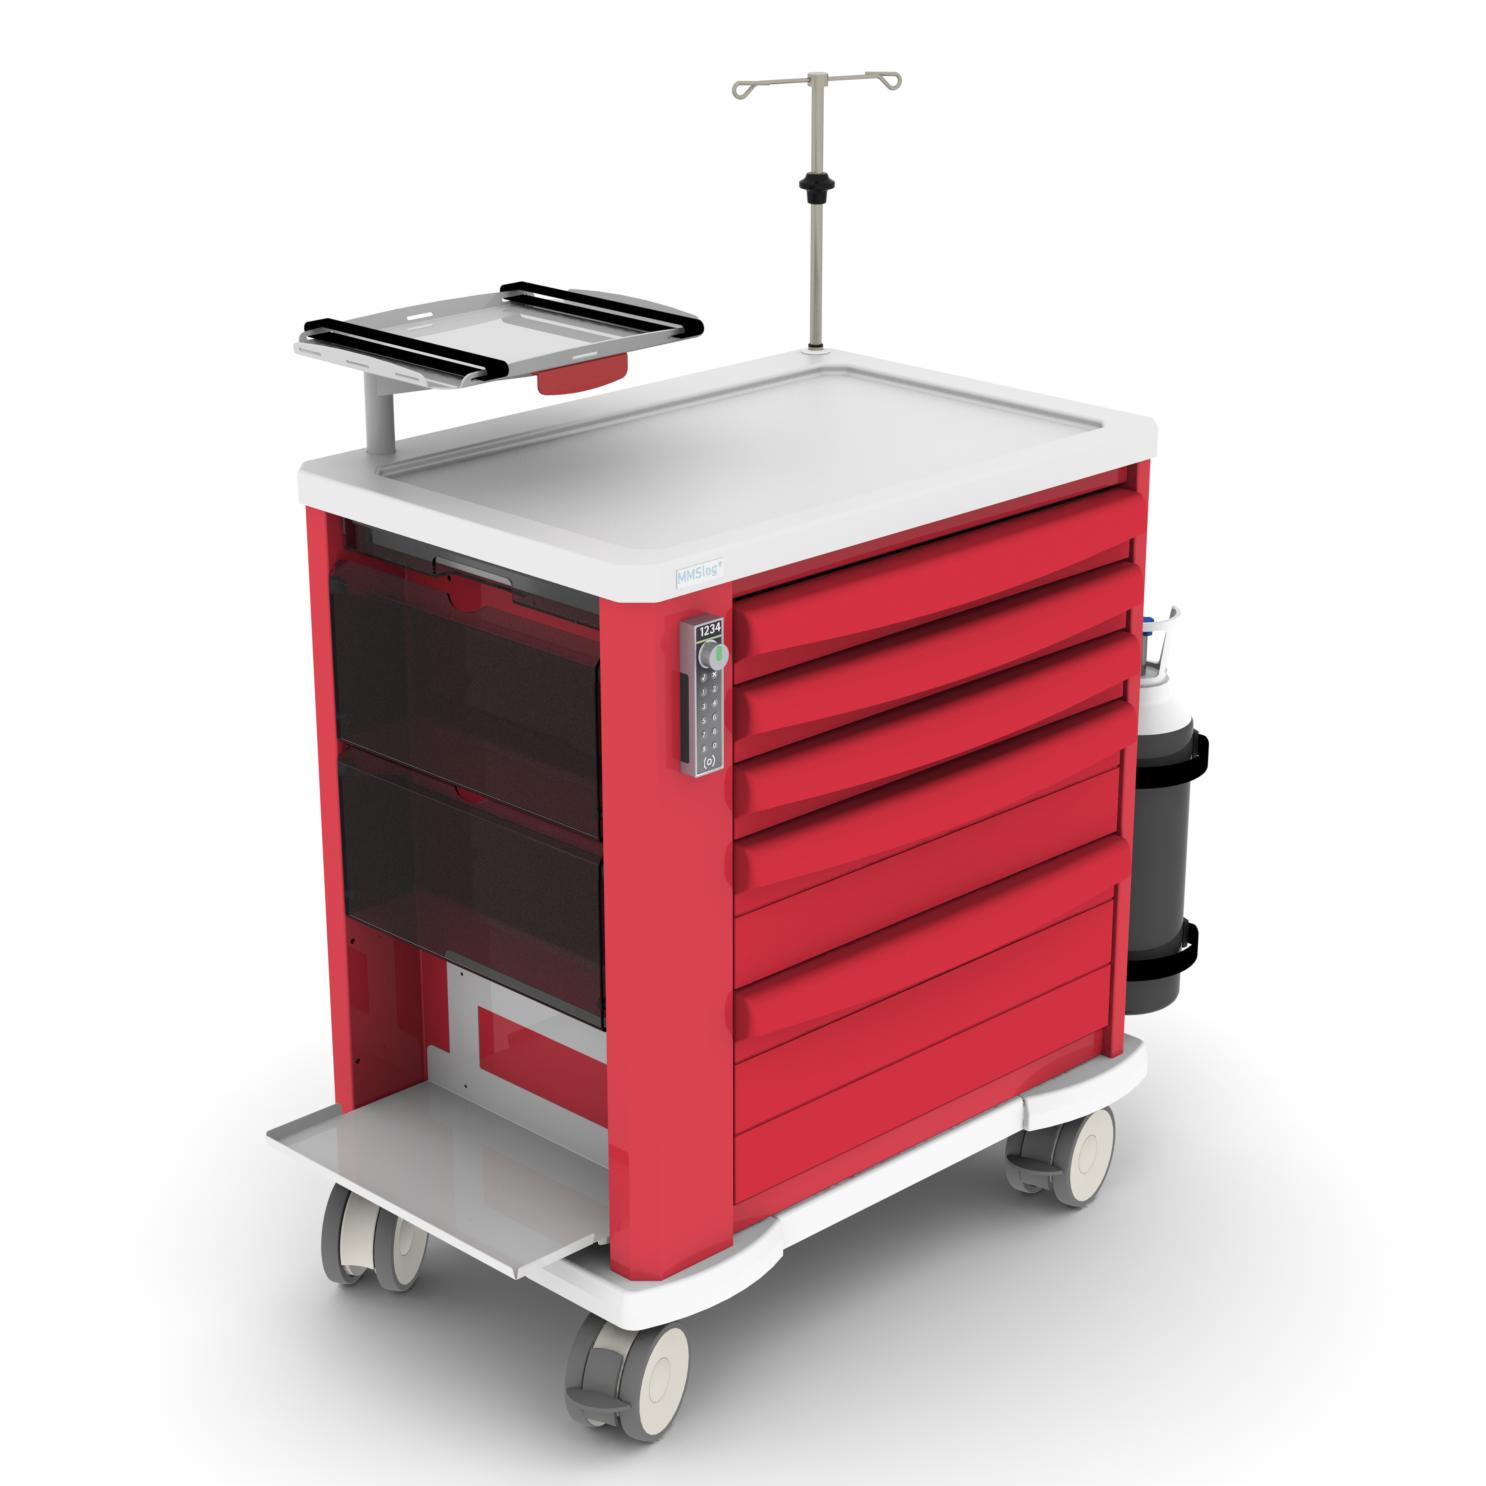 Hospital clipart cart. Multifunctional trolley modular storage